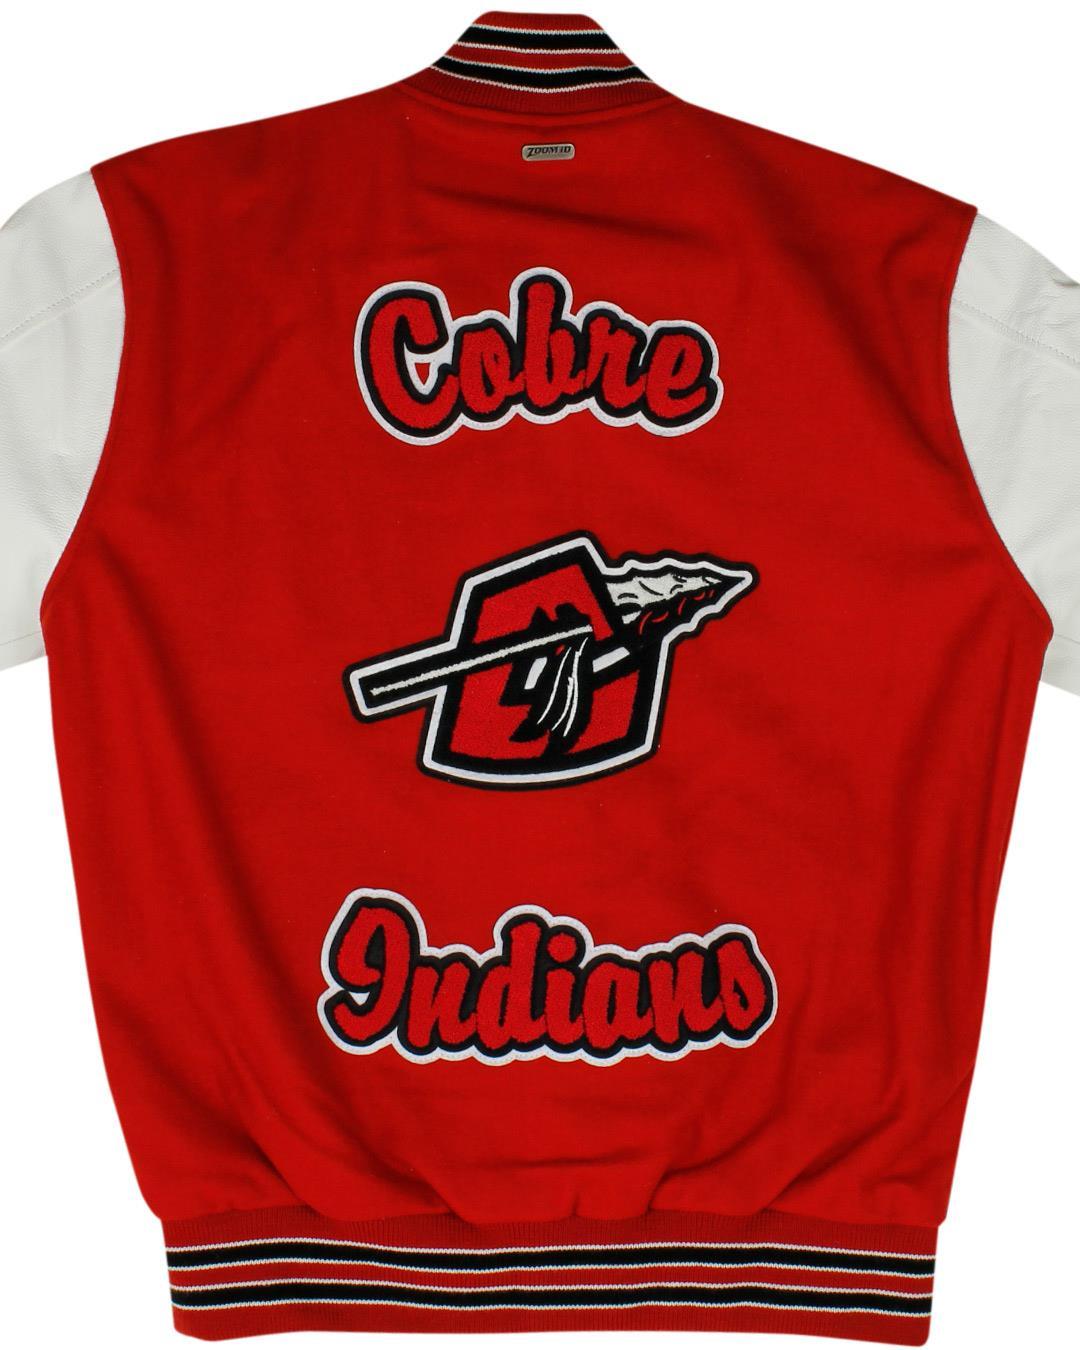 Cobre High School Letterman Jacket, Bayard NM - Back